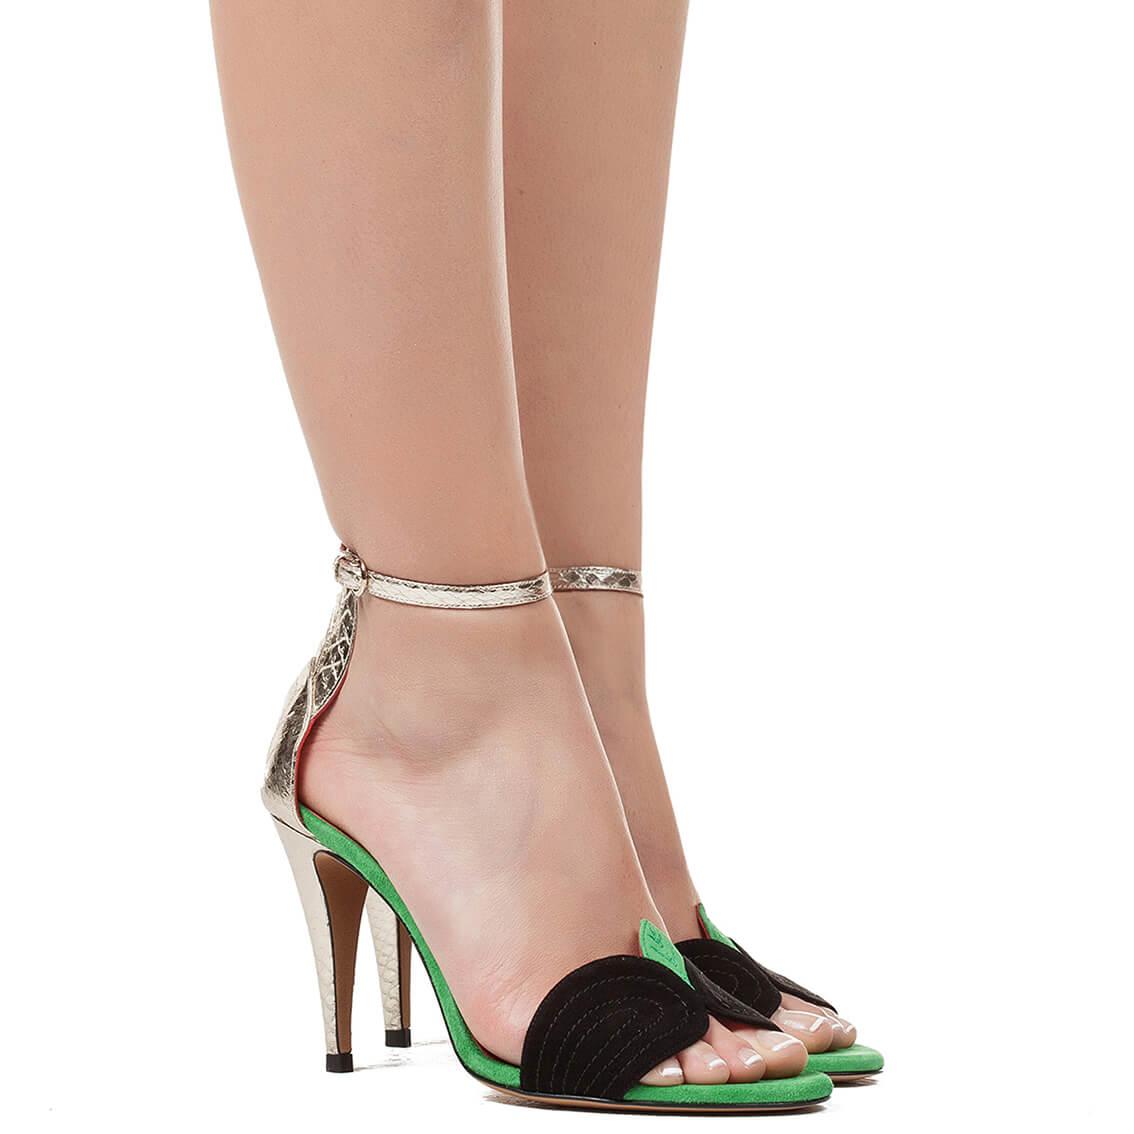 6bd318bf8 Ankle strap high heel sandals - online shoe store Pura Lopez . PURA ...